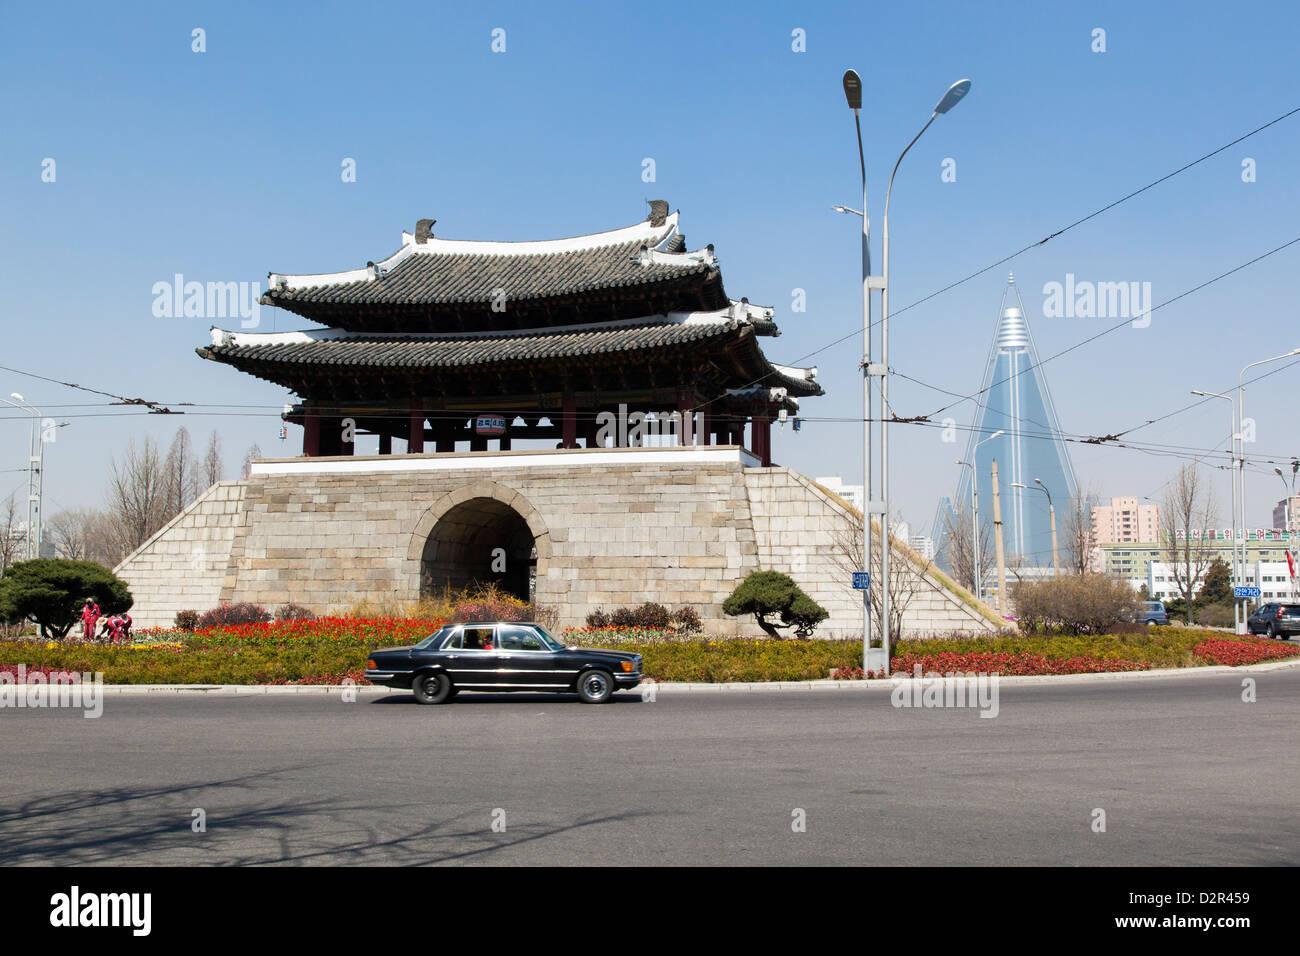 Pyongyang, Democratic People's Republic of Korea (DPRK), North Korea, Asia - Stock Image